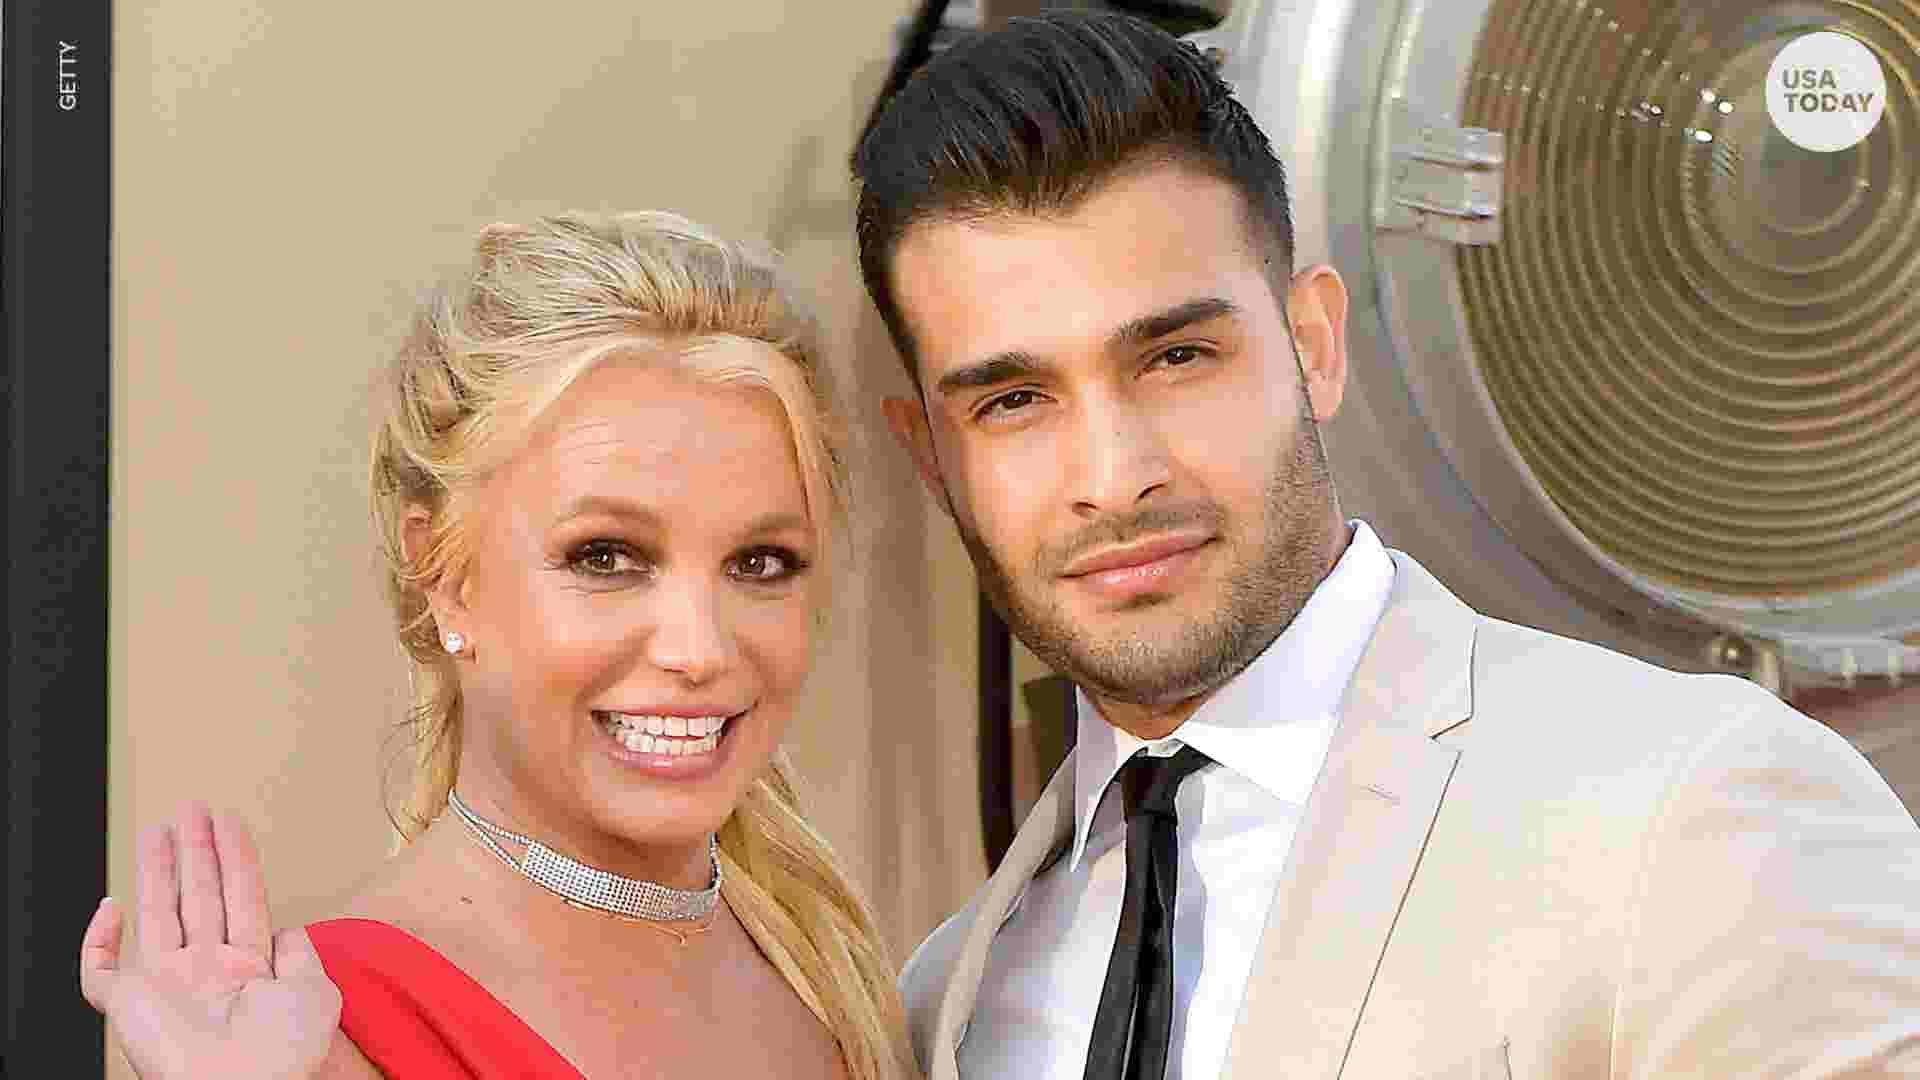 Britney Spears dyes her trademark blond hair brunette: 'New